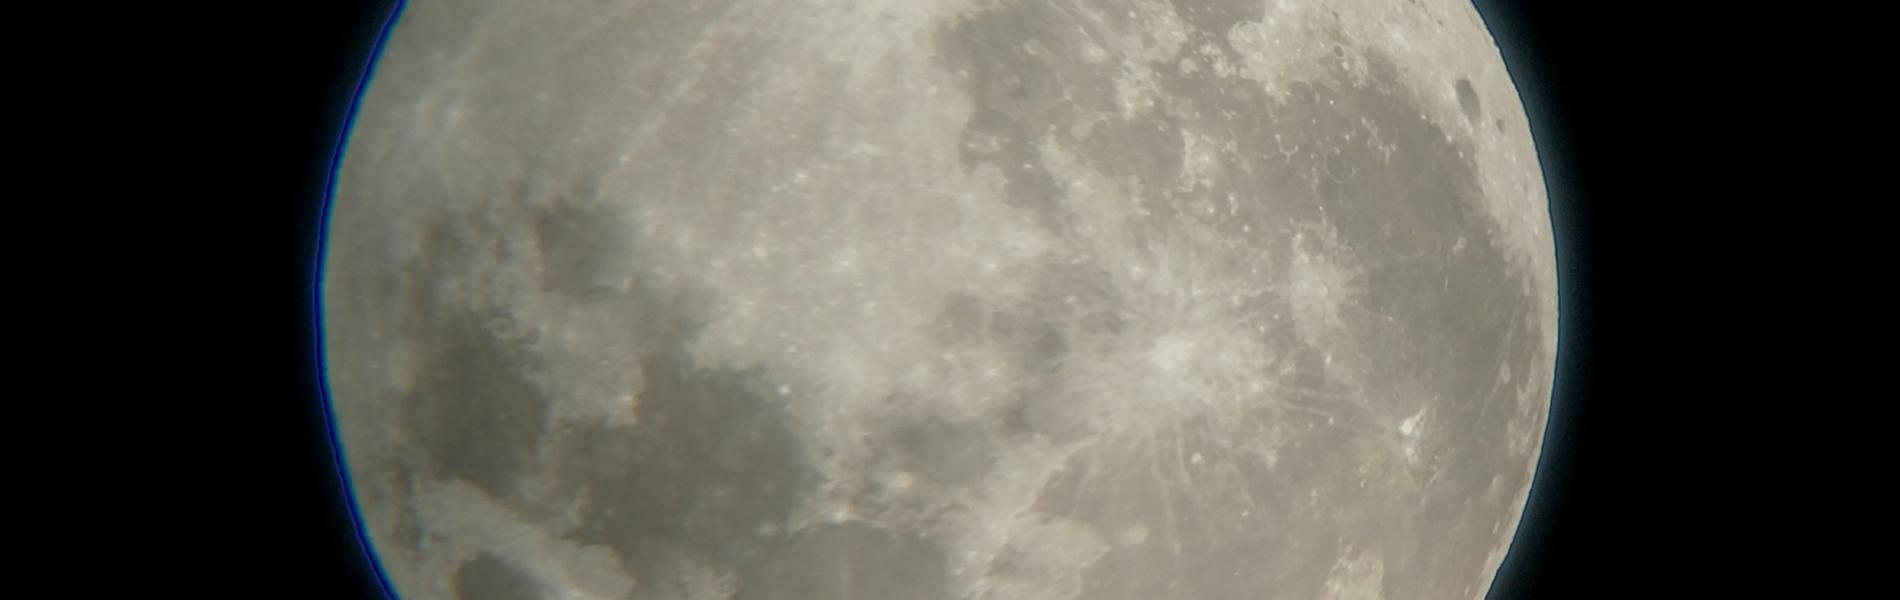 Lunar Astronomy